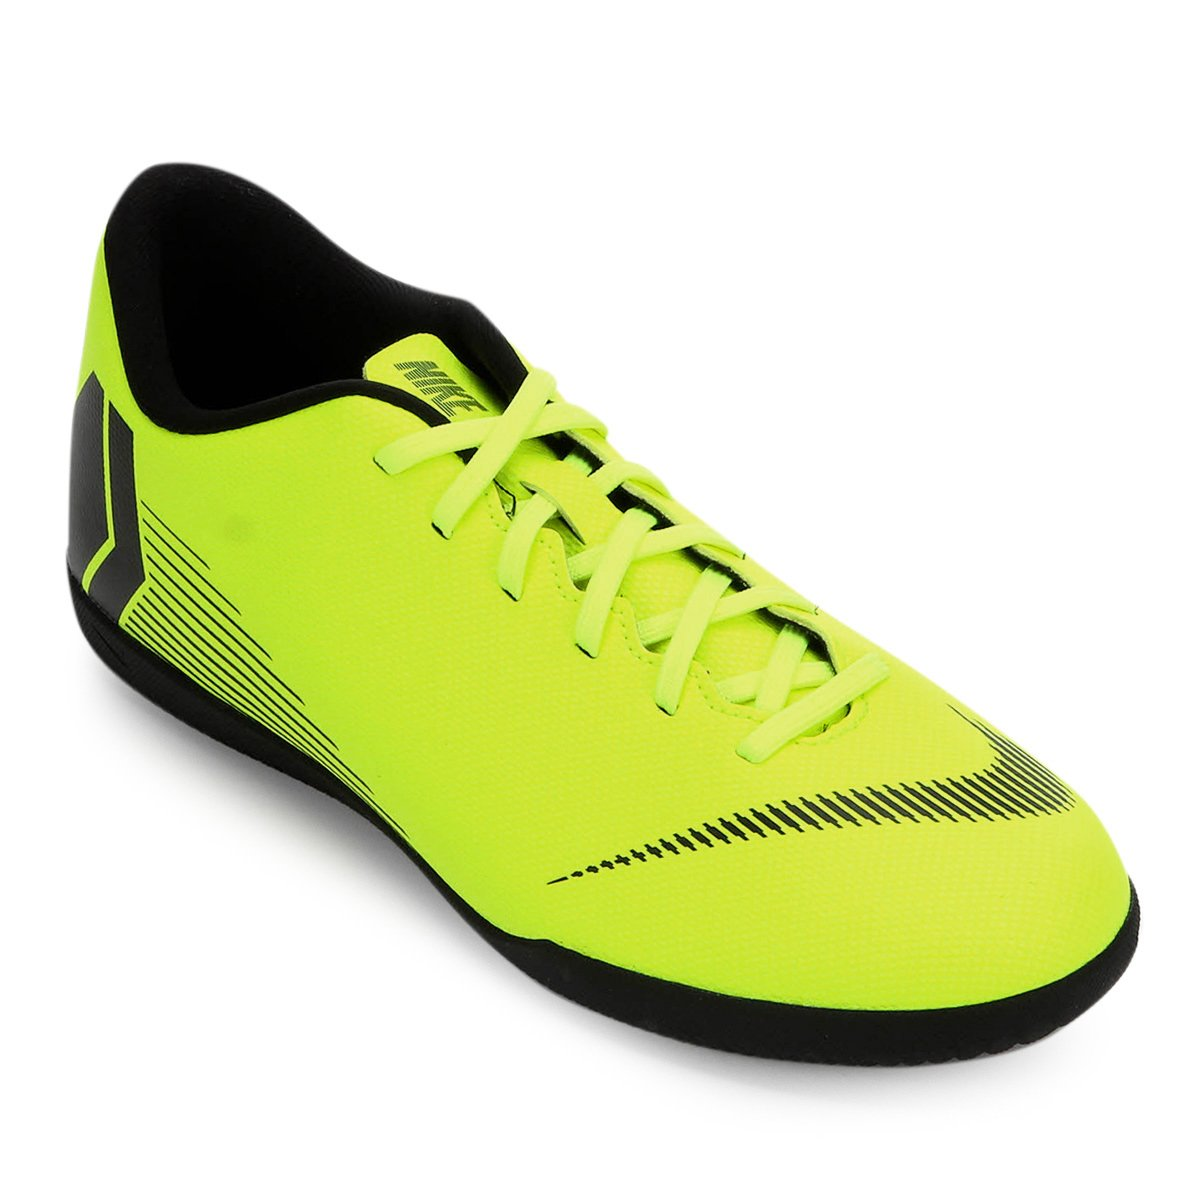 b7055dda45 Chuteira Futsal Nike Mercurial Vapor 12 Club - Amarelo e Preto ...